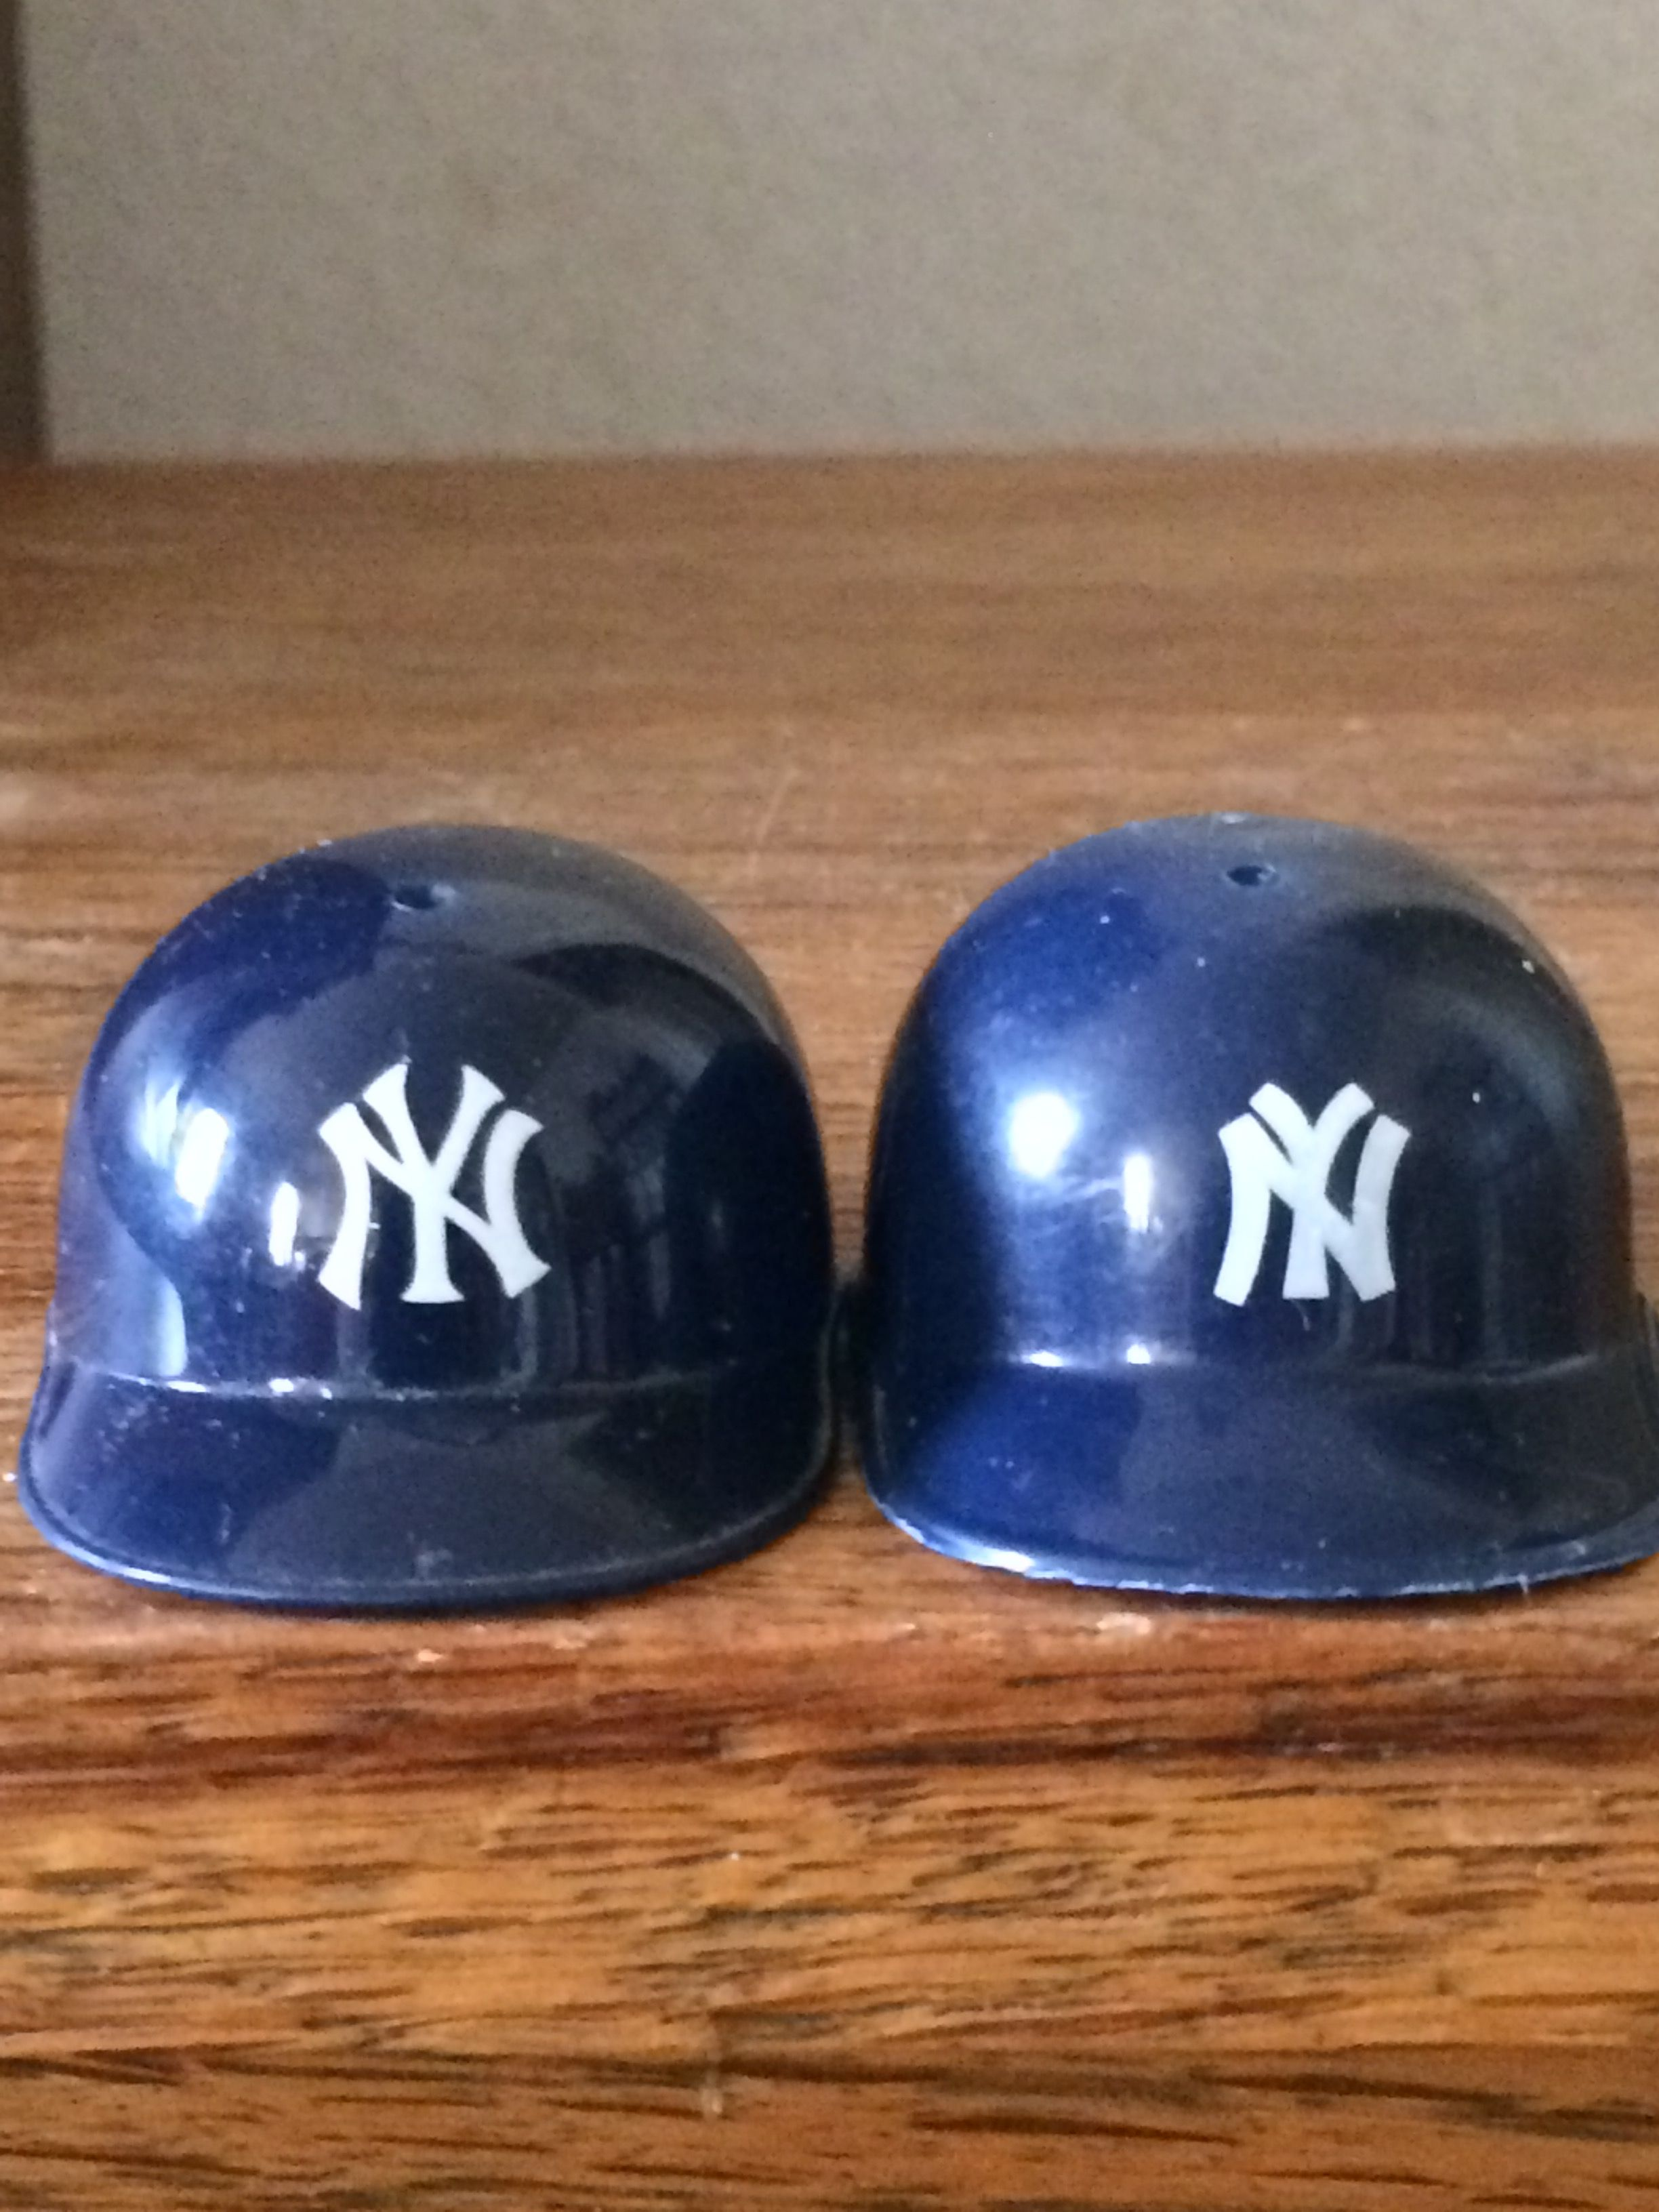 C Flap Helmets May Look Weird But Mlb Stars Are Picking Safety Over Aesthetics Helmet Mlb Riding Helmets